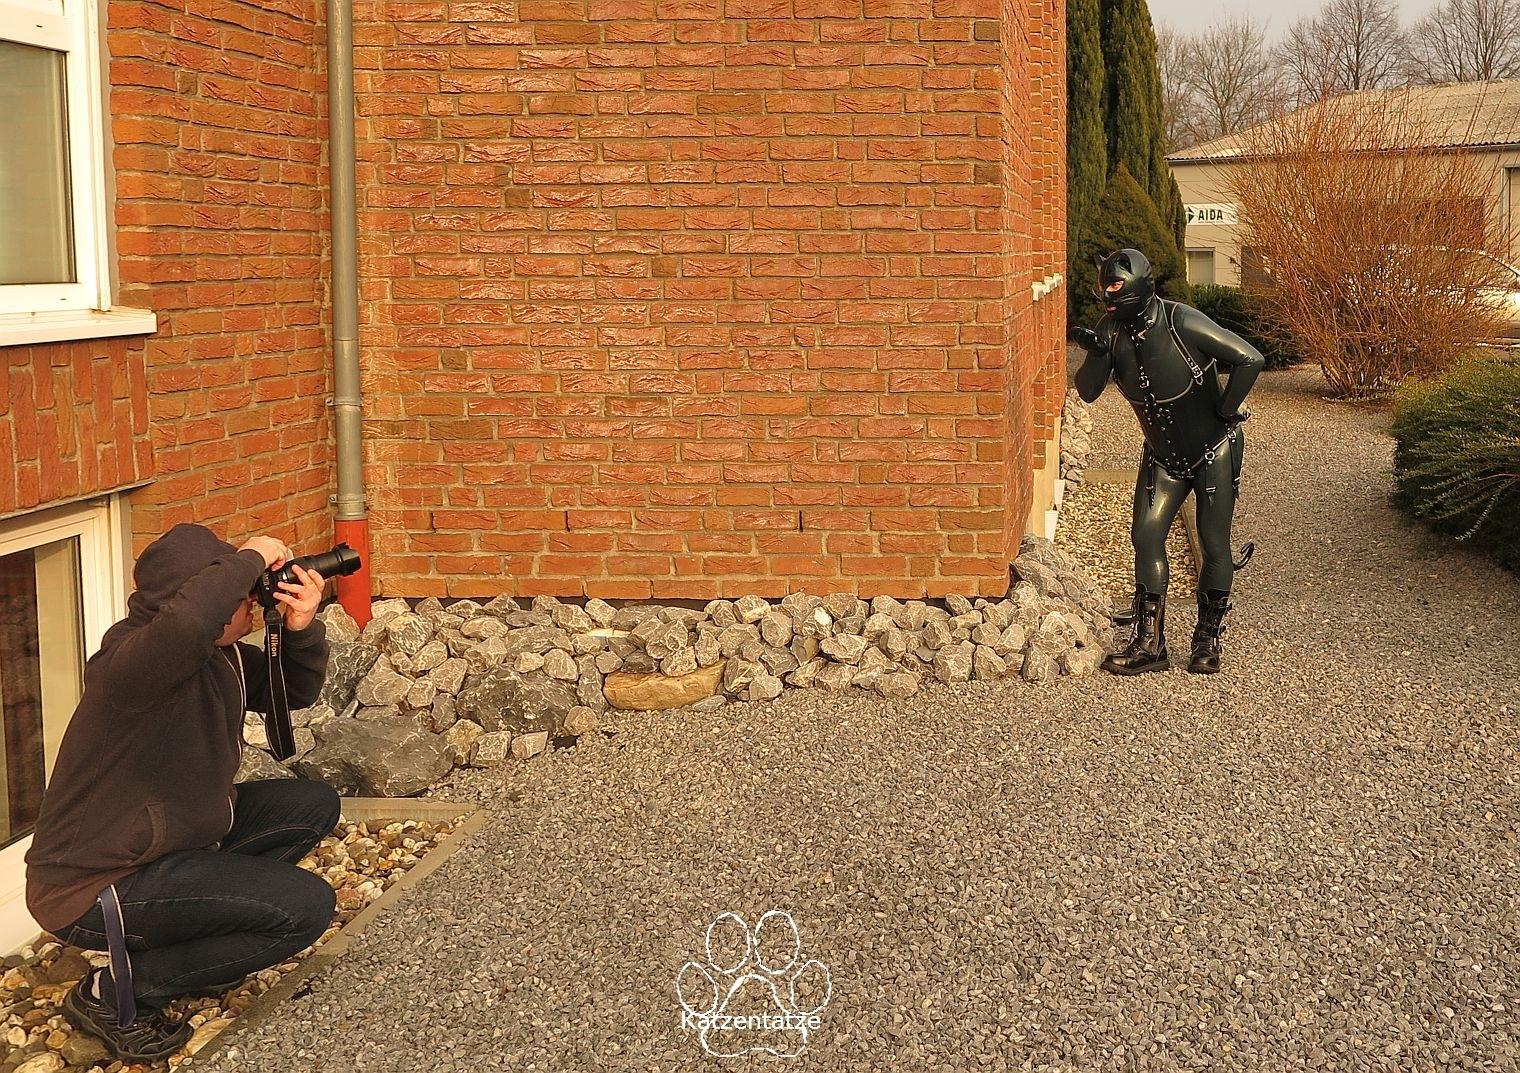 Making-Of Outdoor-Shooting am Designhotel